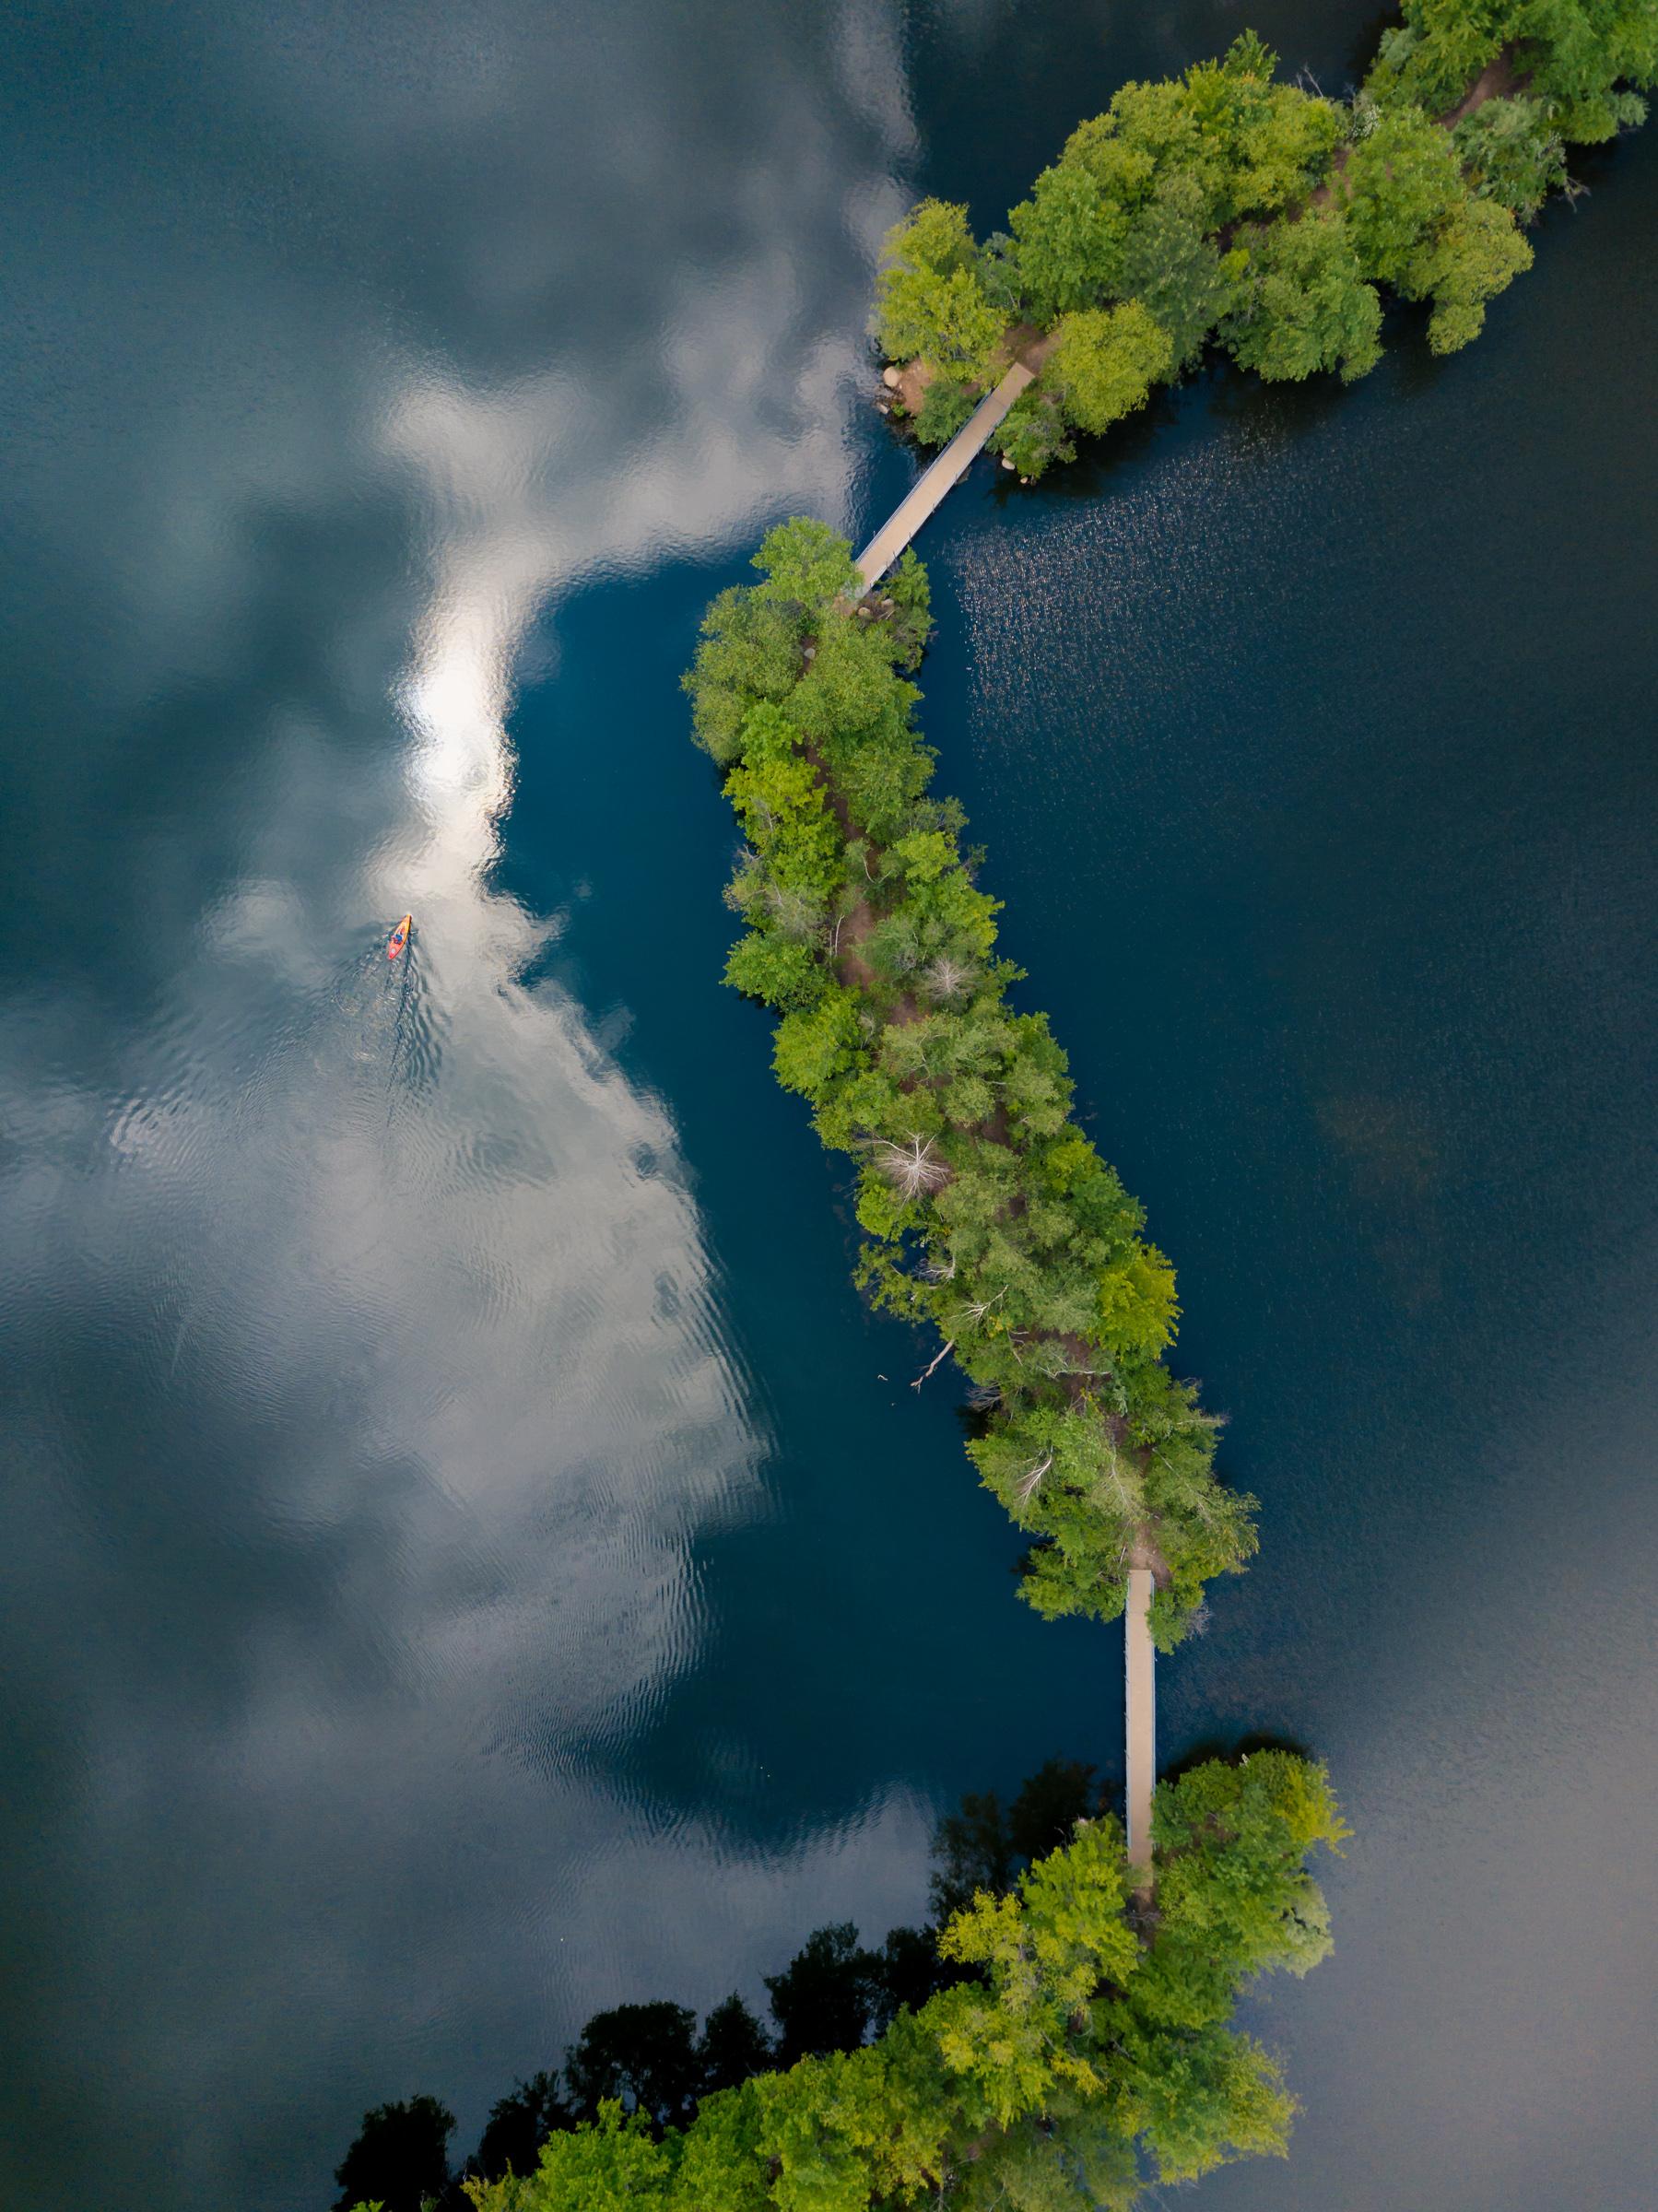 cloud9_typoland_aerial.jpg